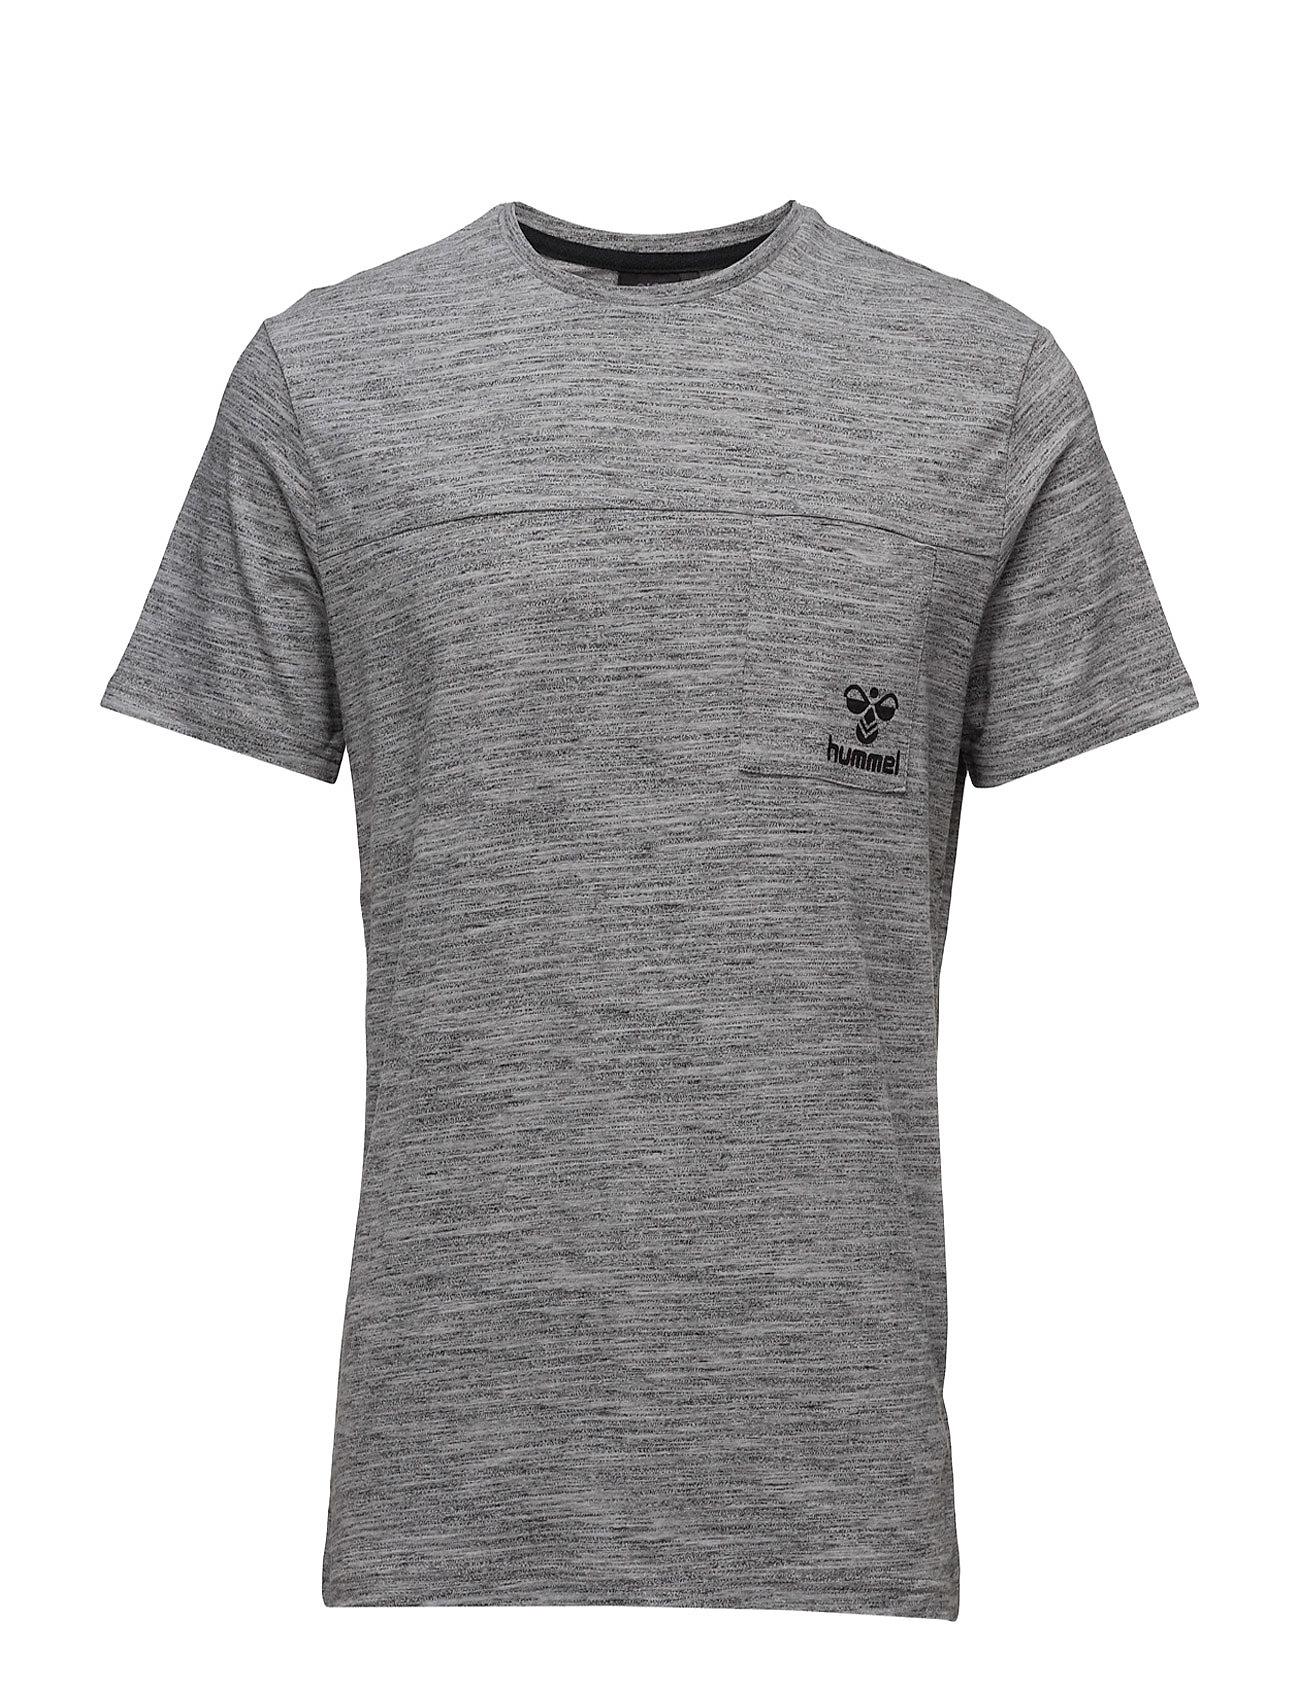 Classic Bee Willum Ss Tee Hummel Løbe t-shirts til Herrer i Grey Melange